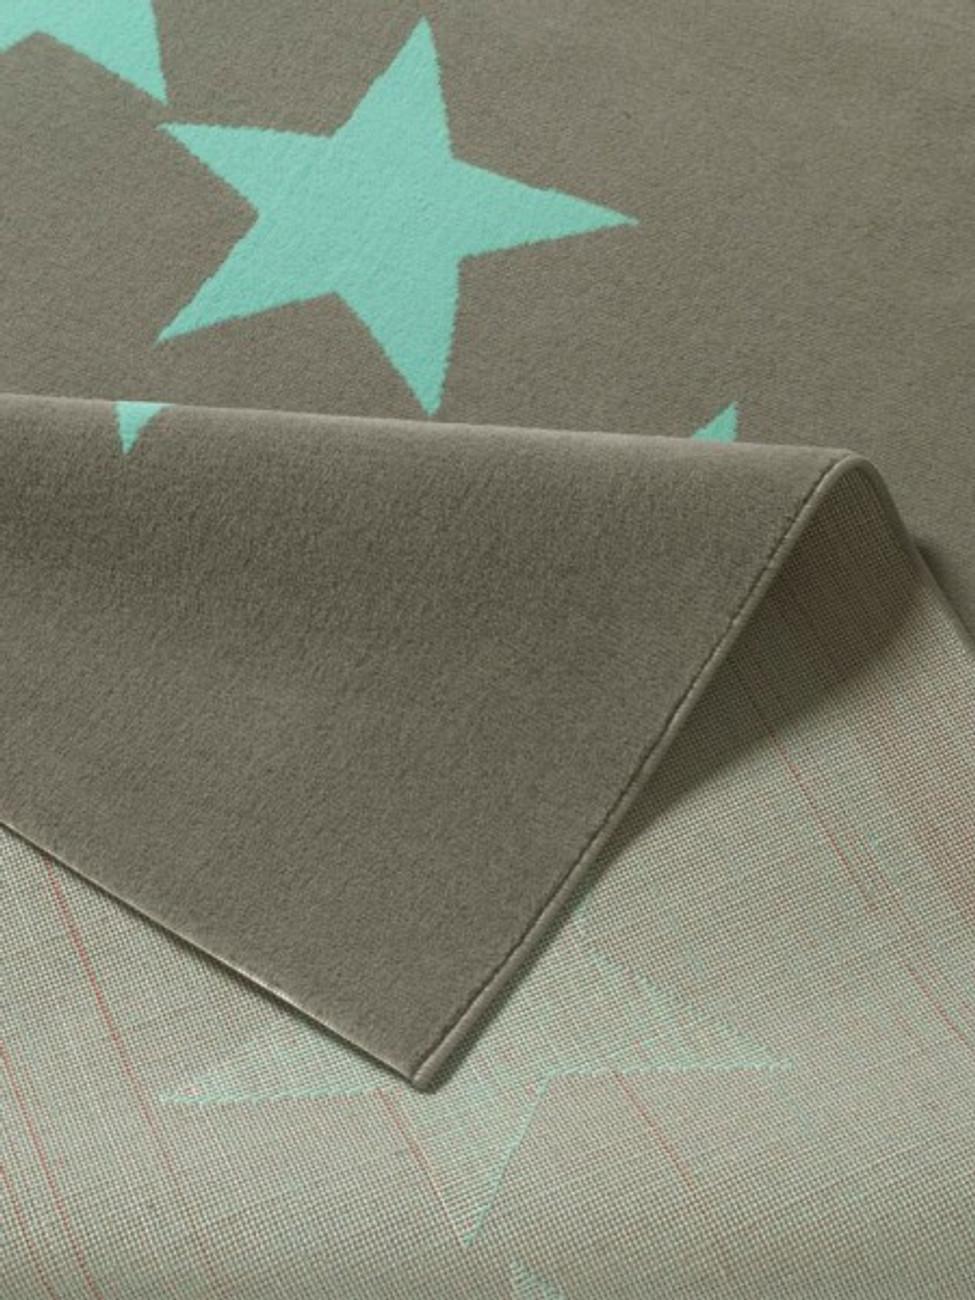 design velours teppich sterne grau blau 140x200 cm 102327 teppiche design teppiche. Black Bedroom Furniture Sets. Home Design Ideas